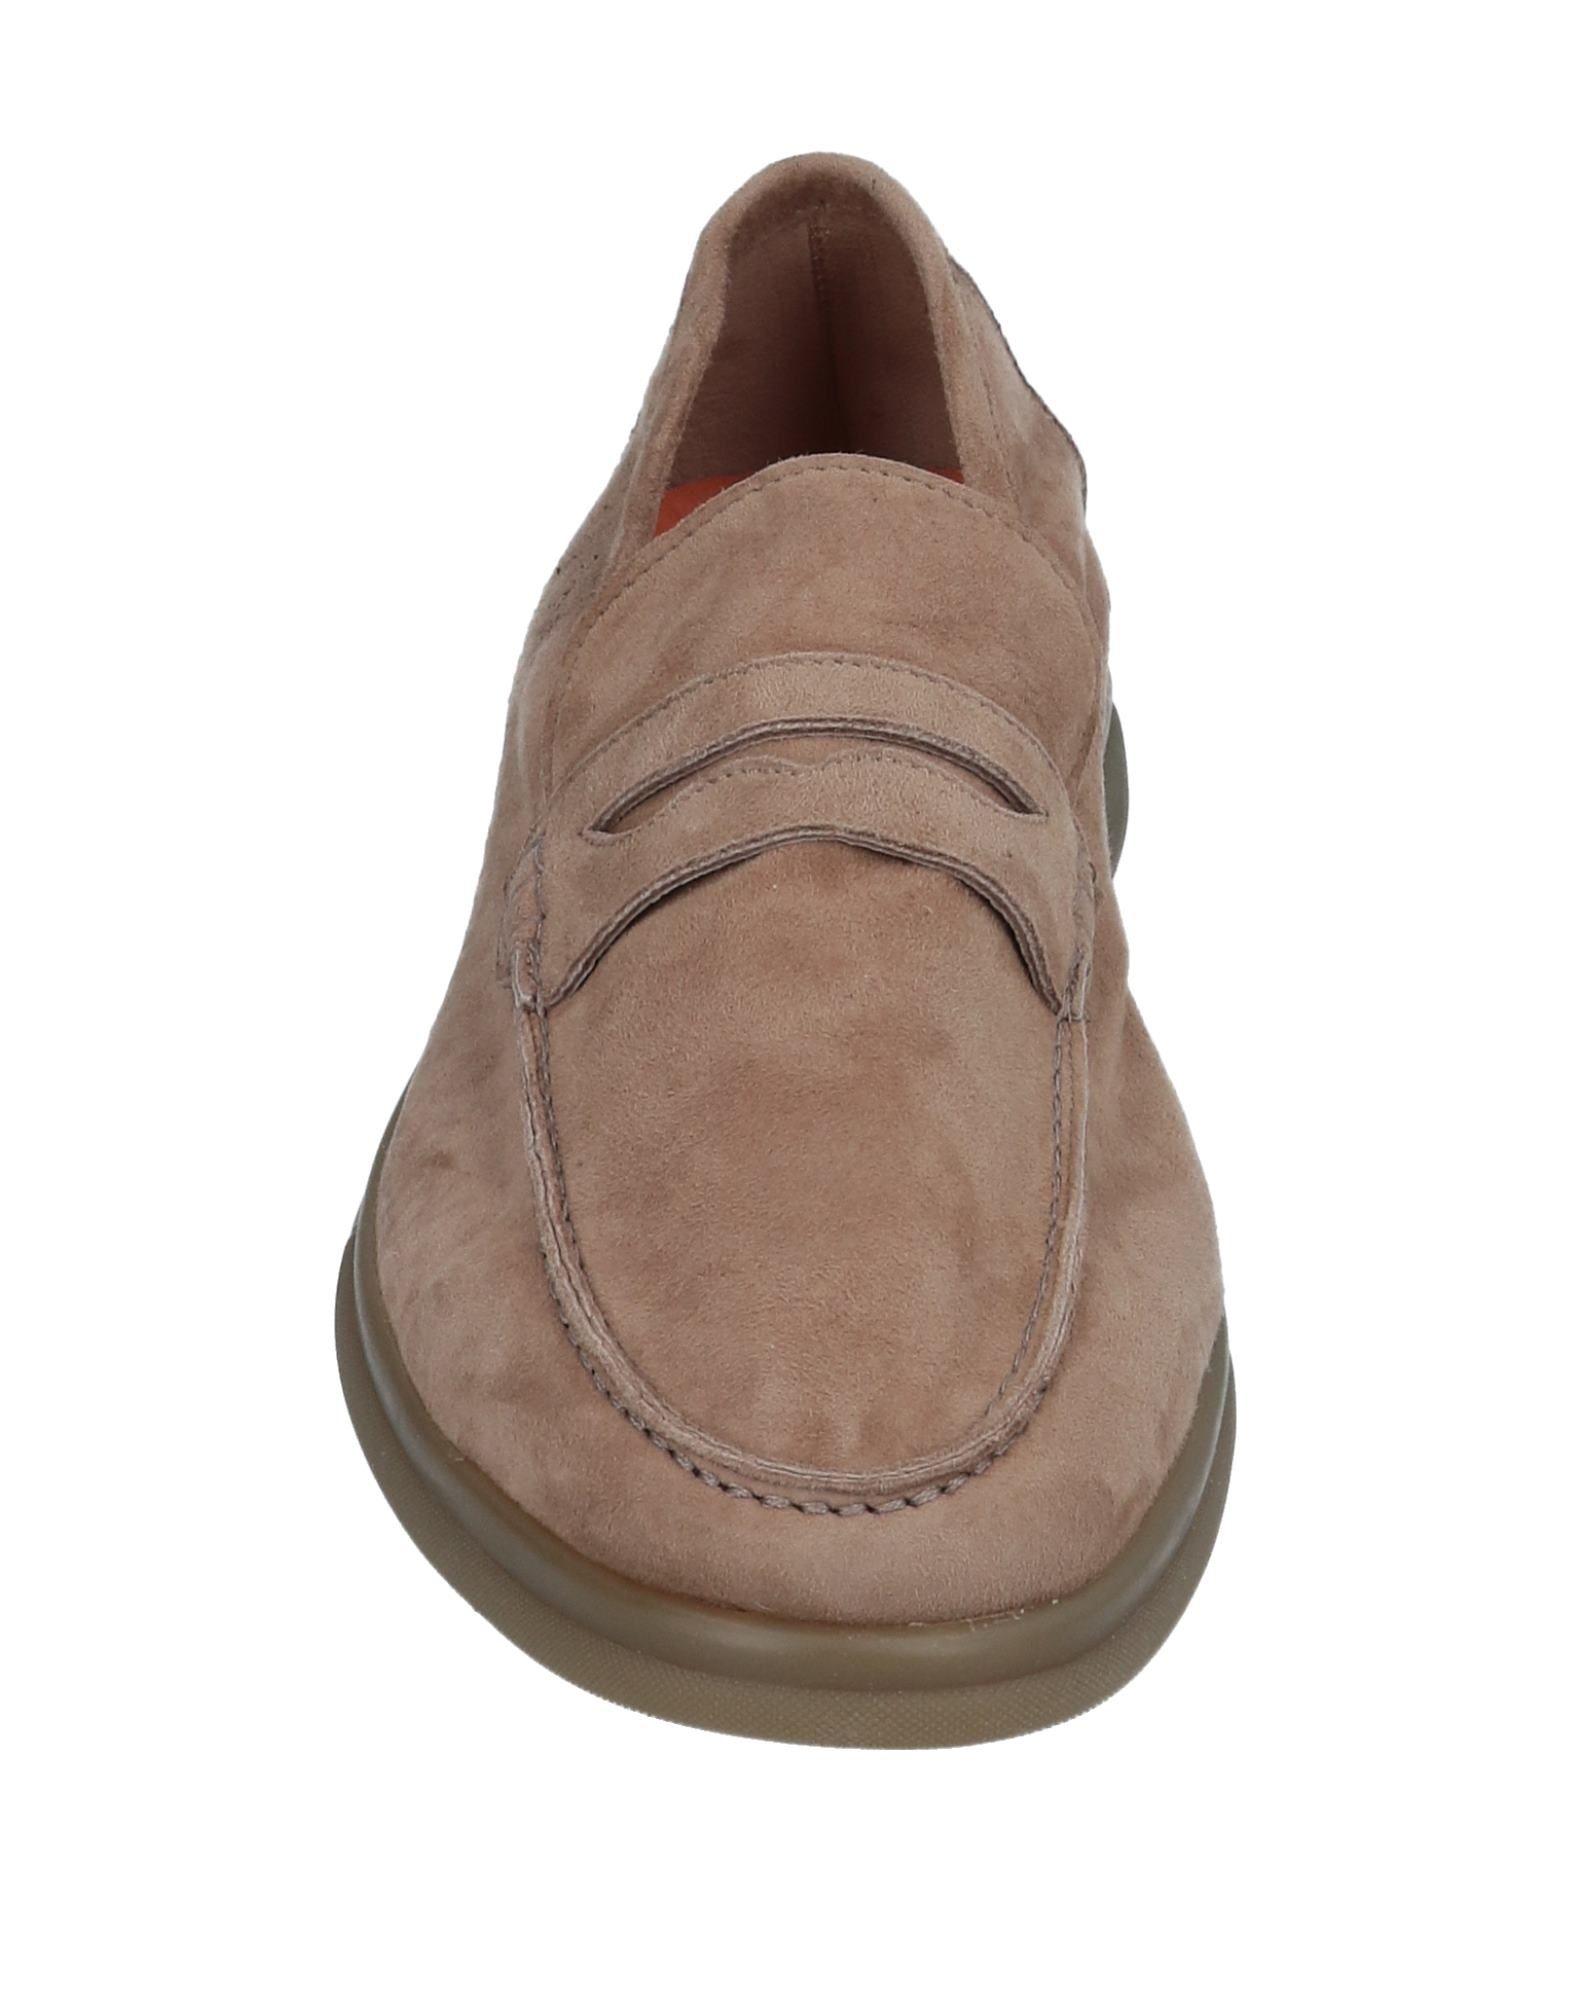 Andrea Ventura Ventura Ventura Firenze Loafers - Men Andrea Ventura Firenze Loafers online on  Canada - 11579982NG 6f2606